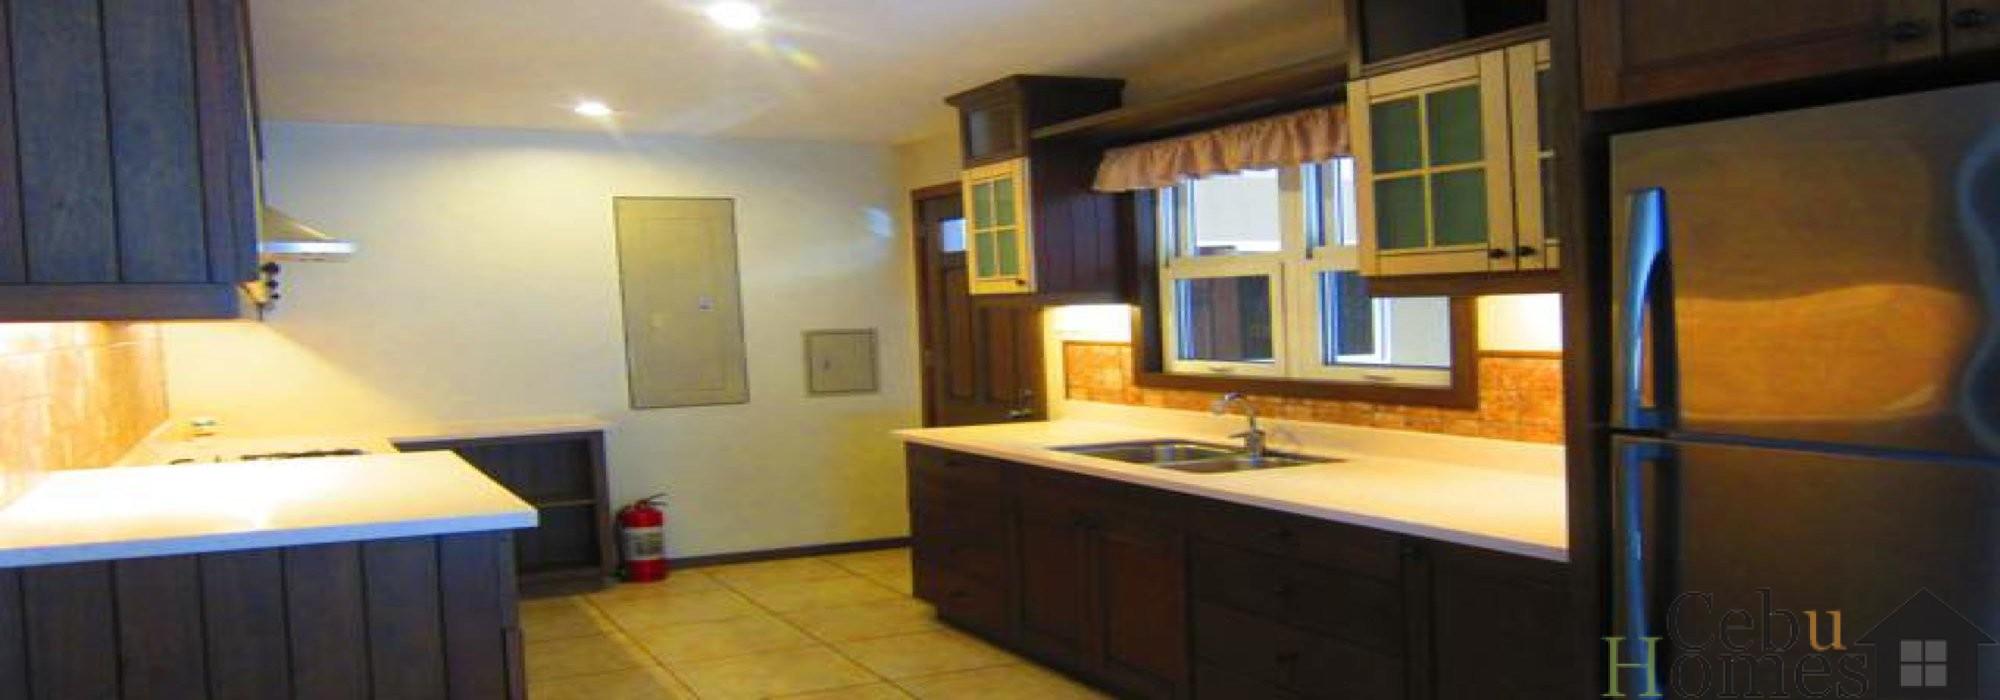 #0284 Five-Bedroom House in Mandaue Subdivision